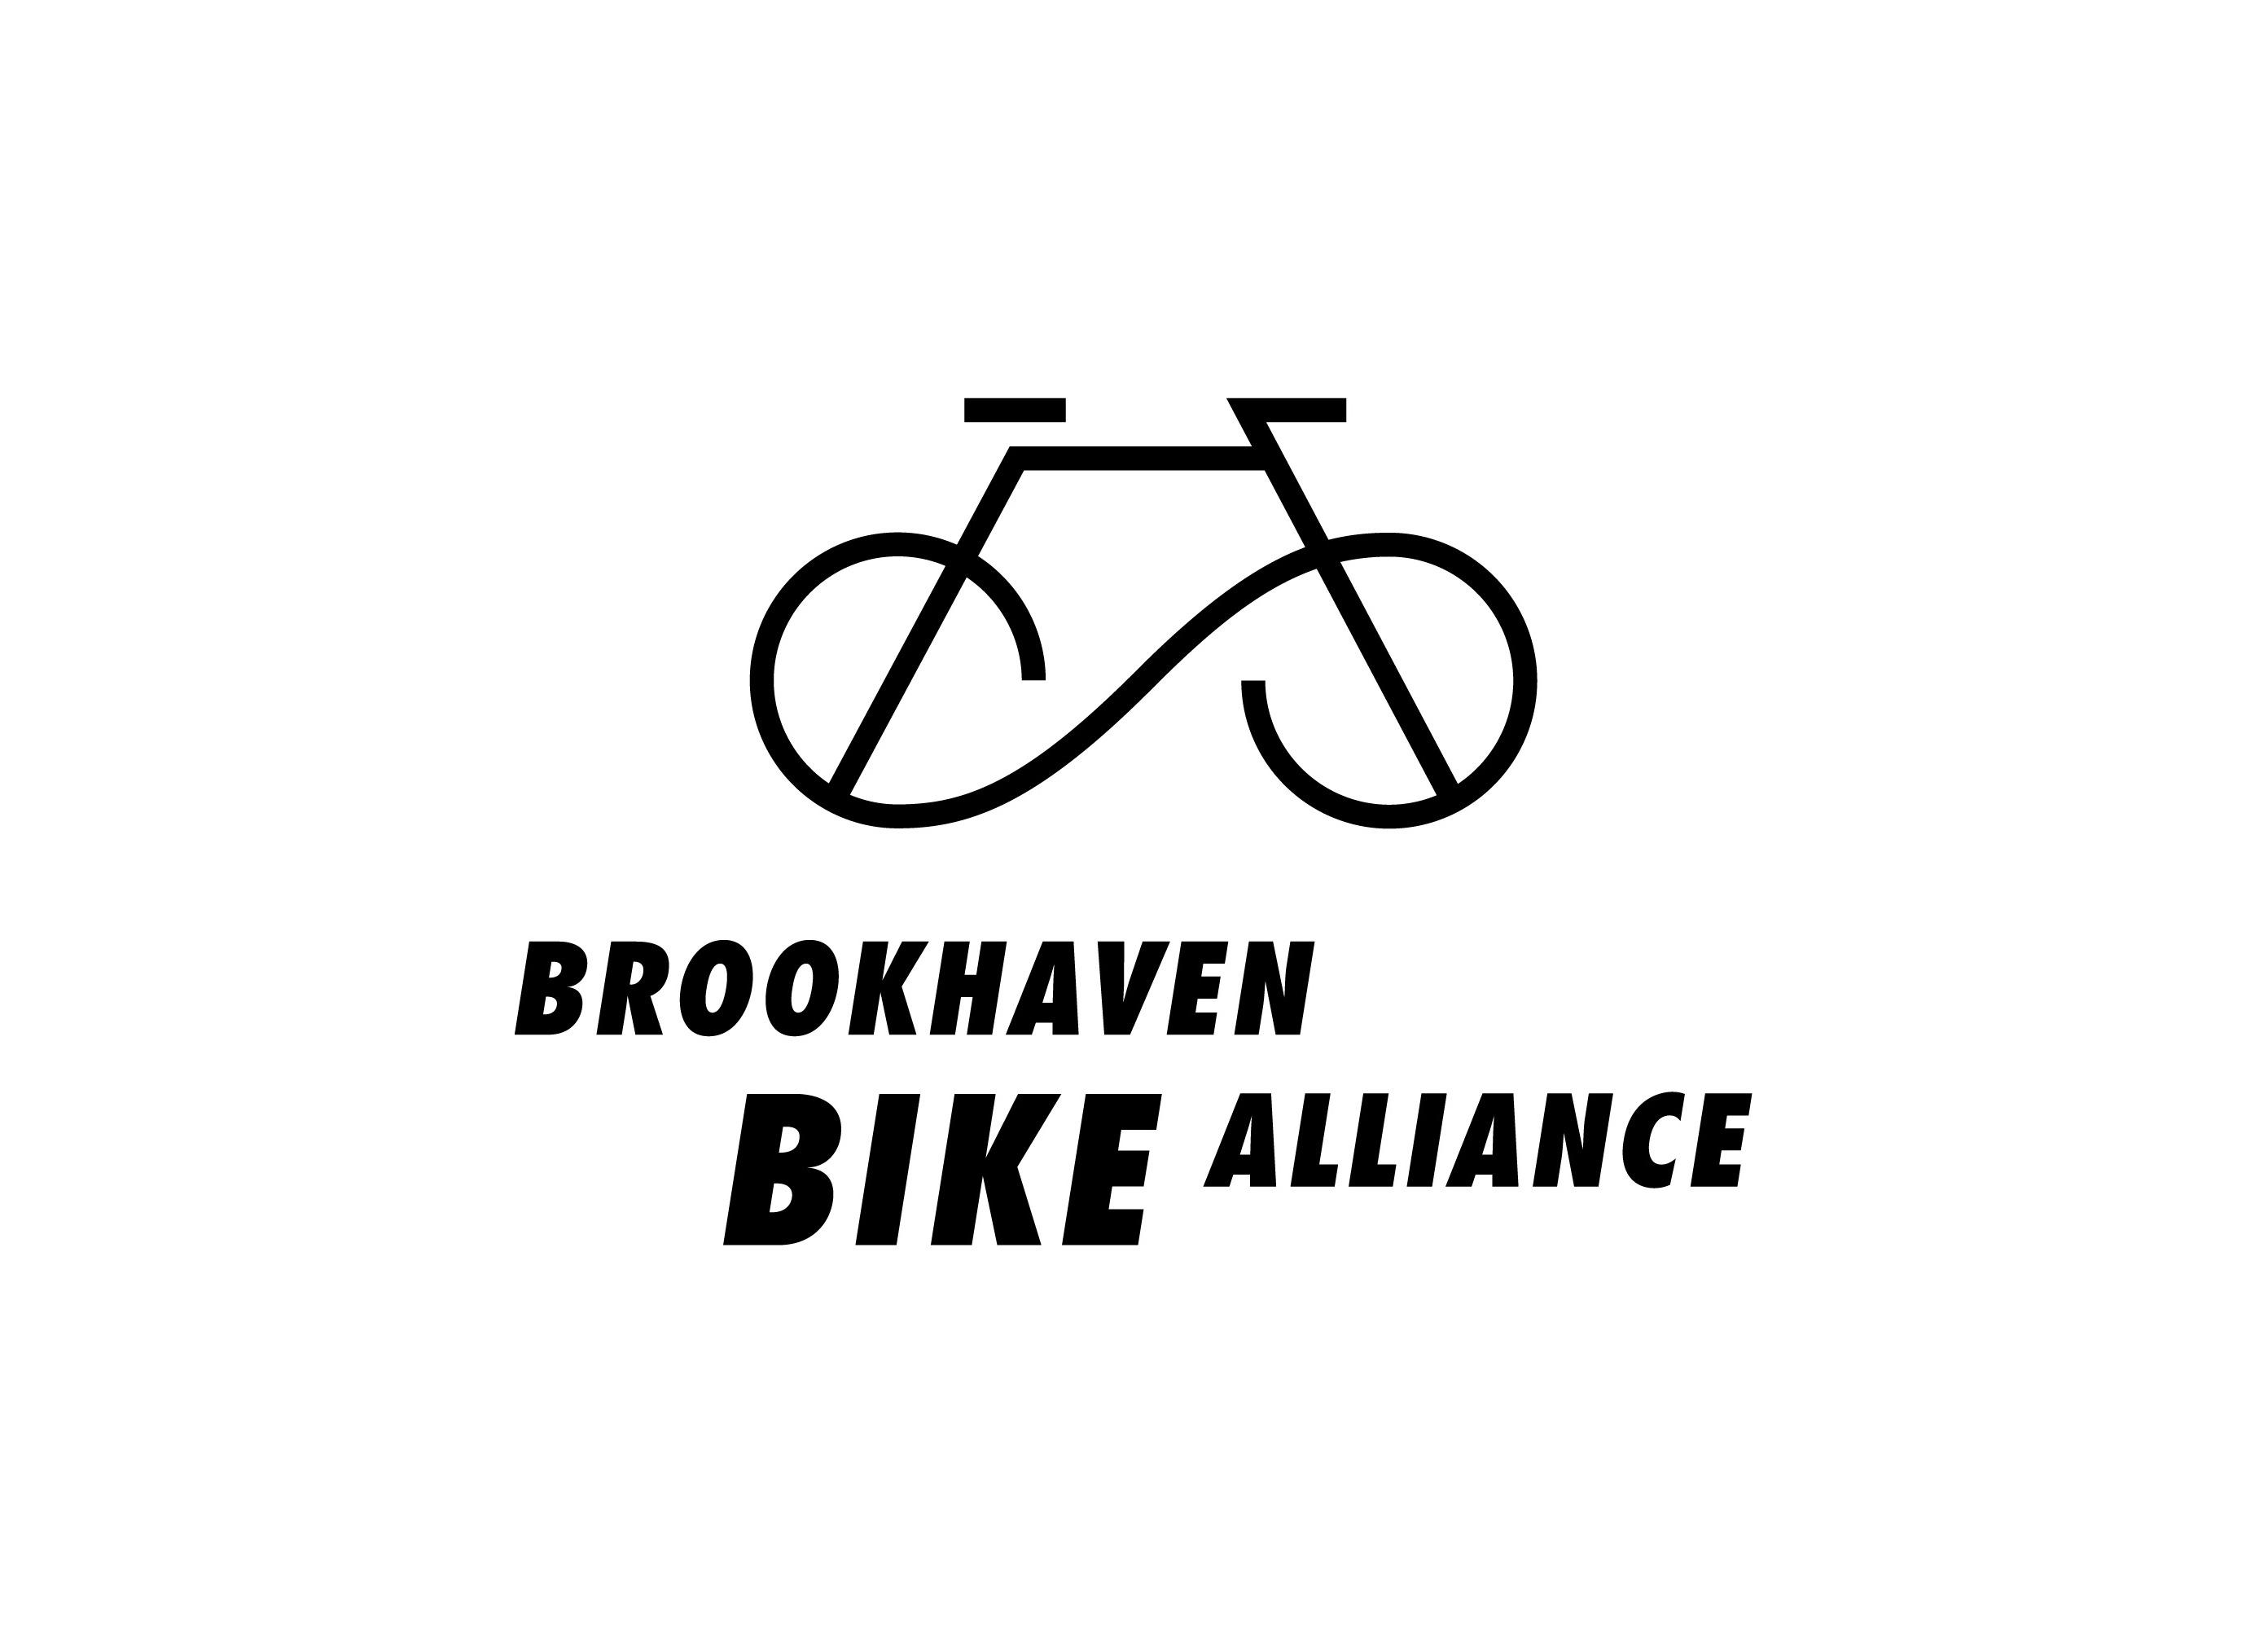 Brookhaven Bike Alliance